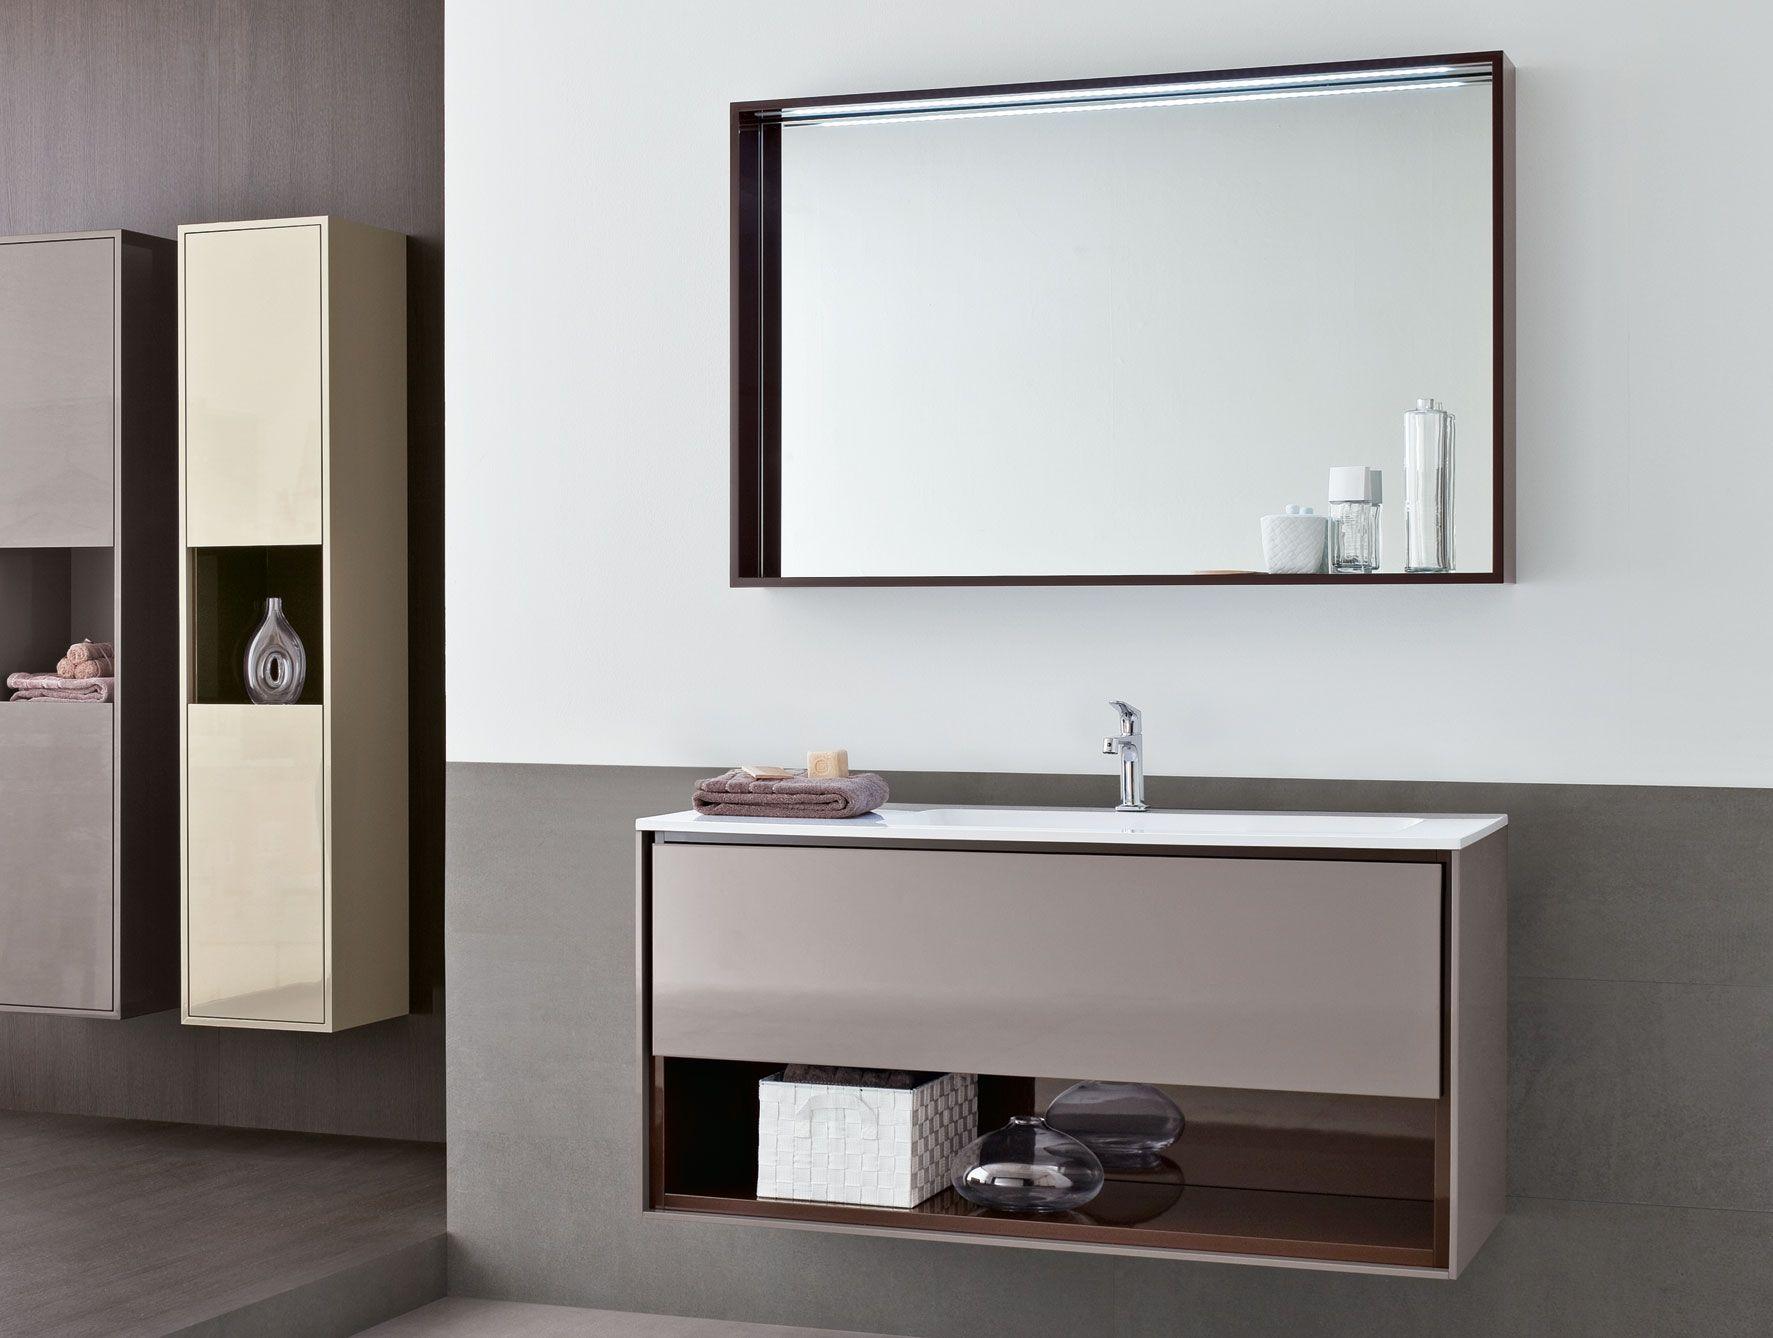 Pin By Oklahoma Home Inspector On Bathroom Sink Cabinets Ikea - Grey floating bathroom vanity